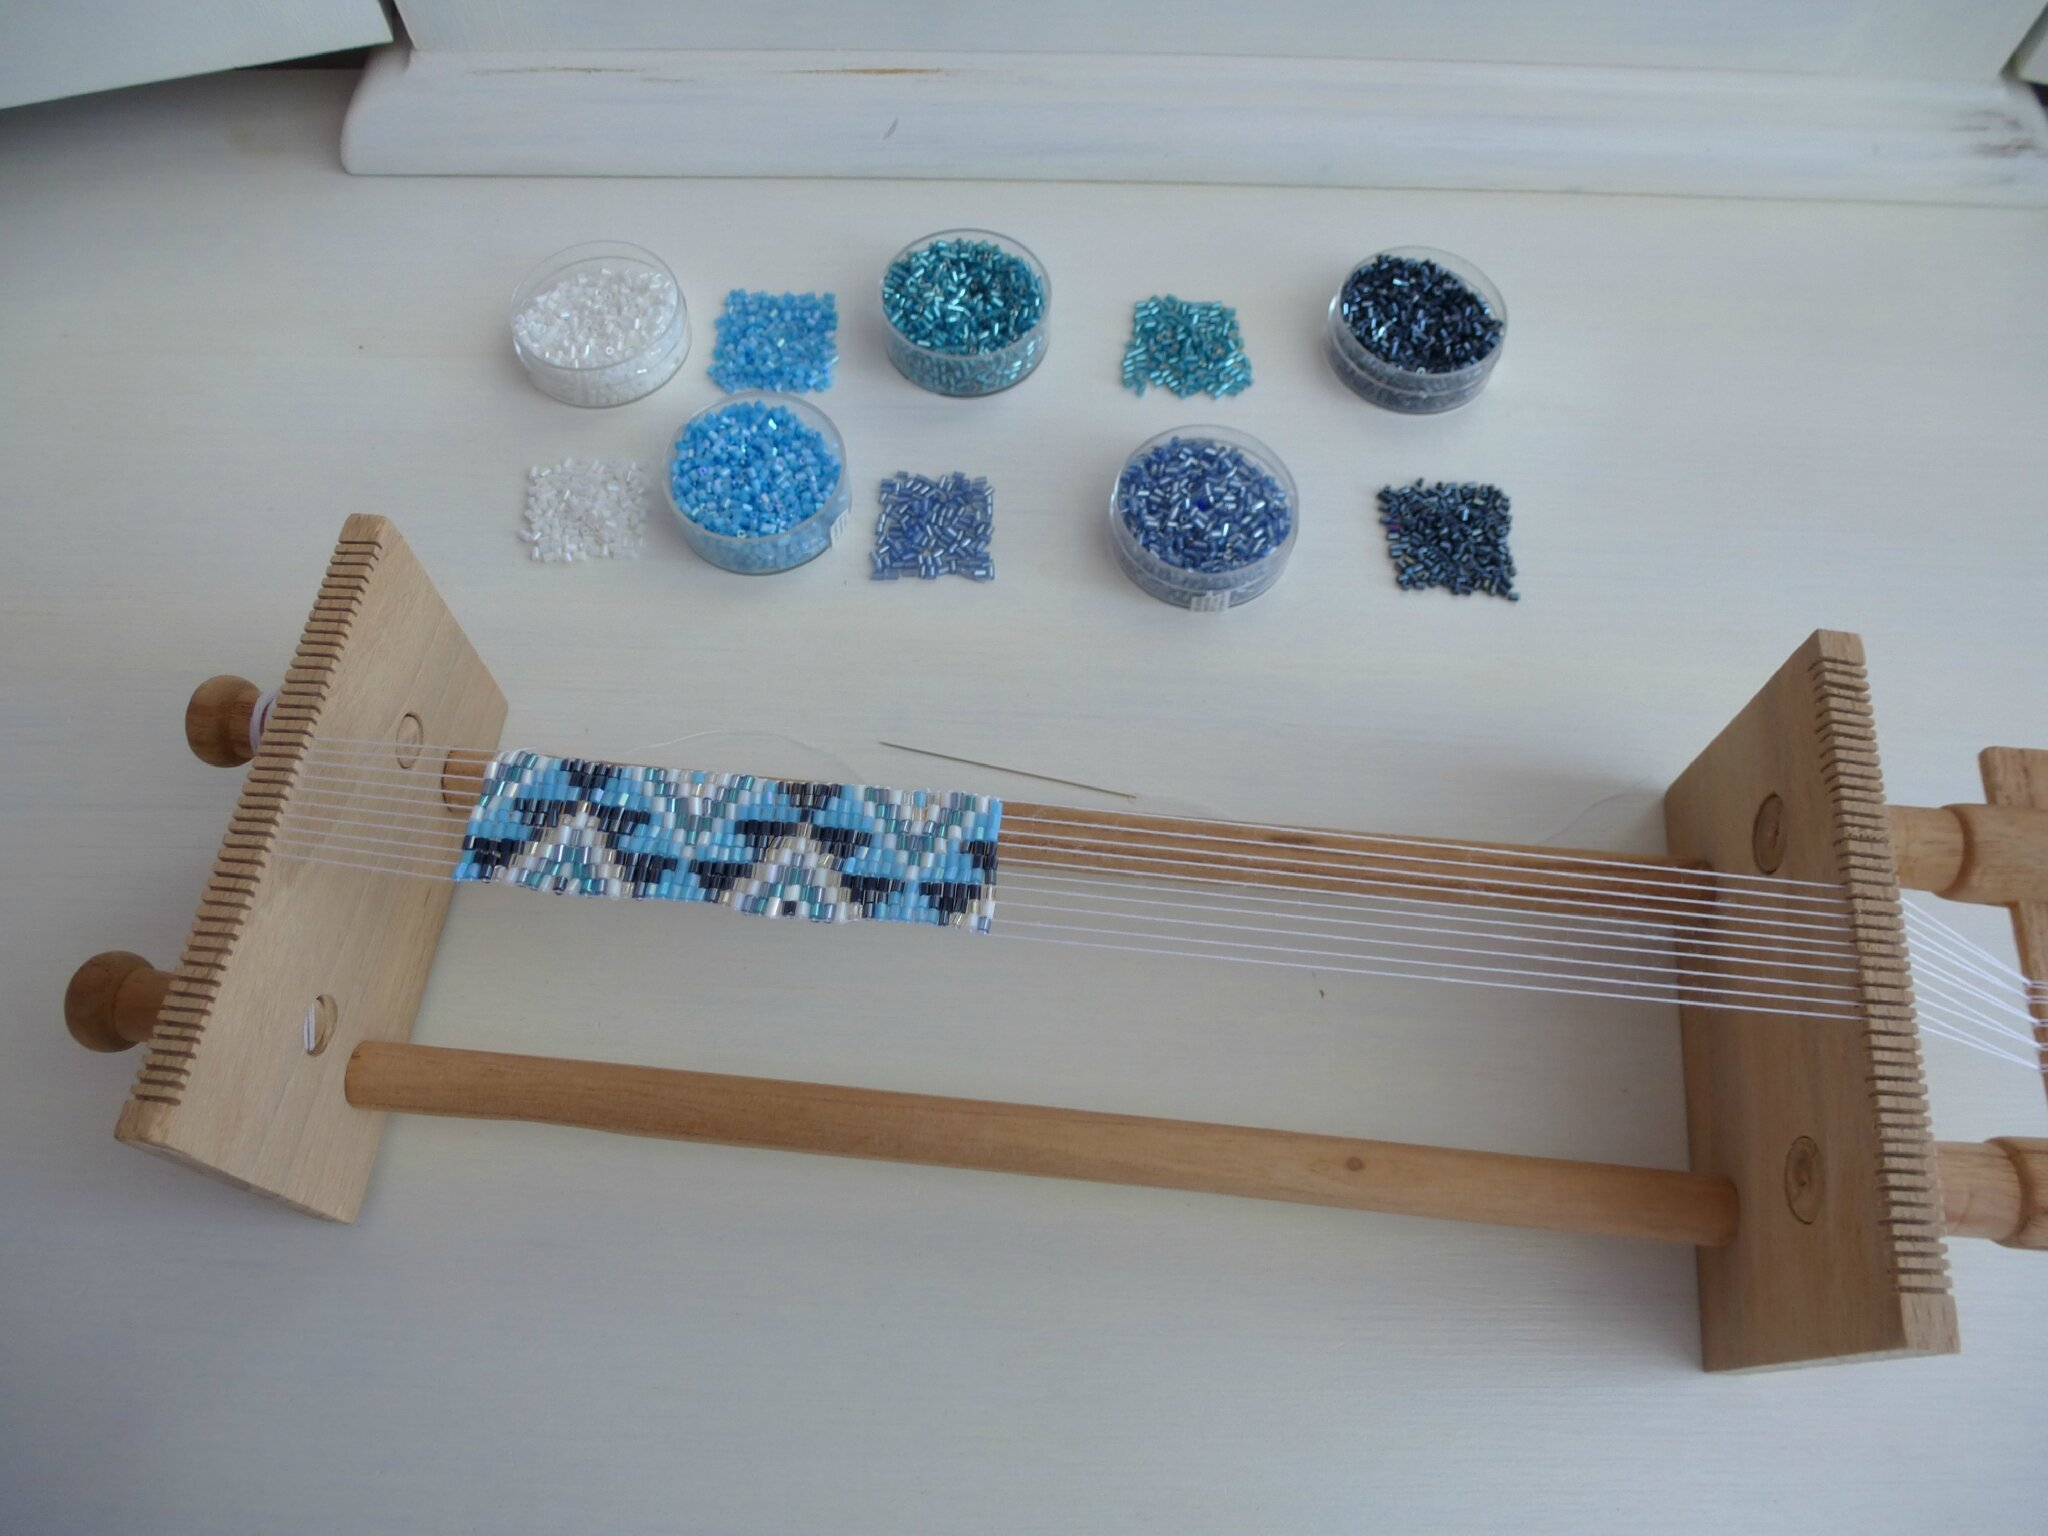 Bracelet Metier A Tisser Perles Fontaine Developpement